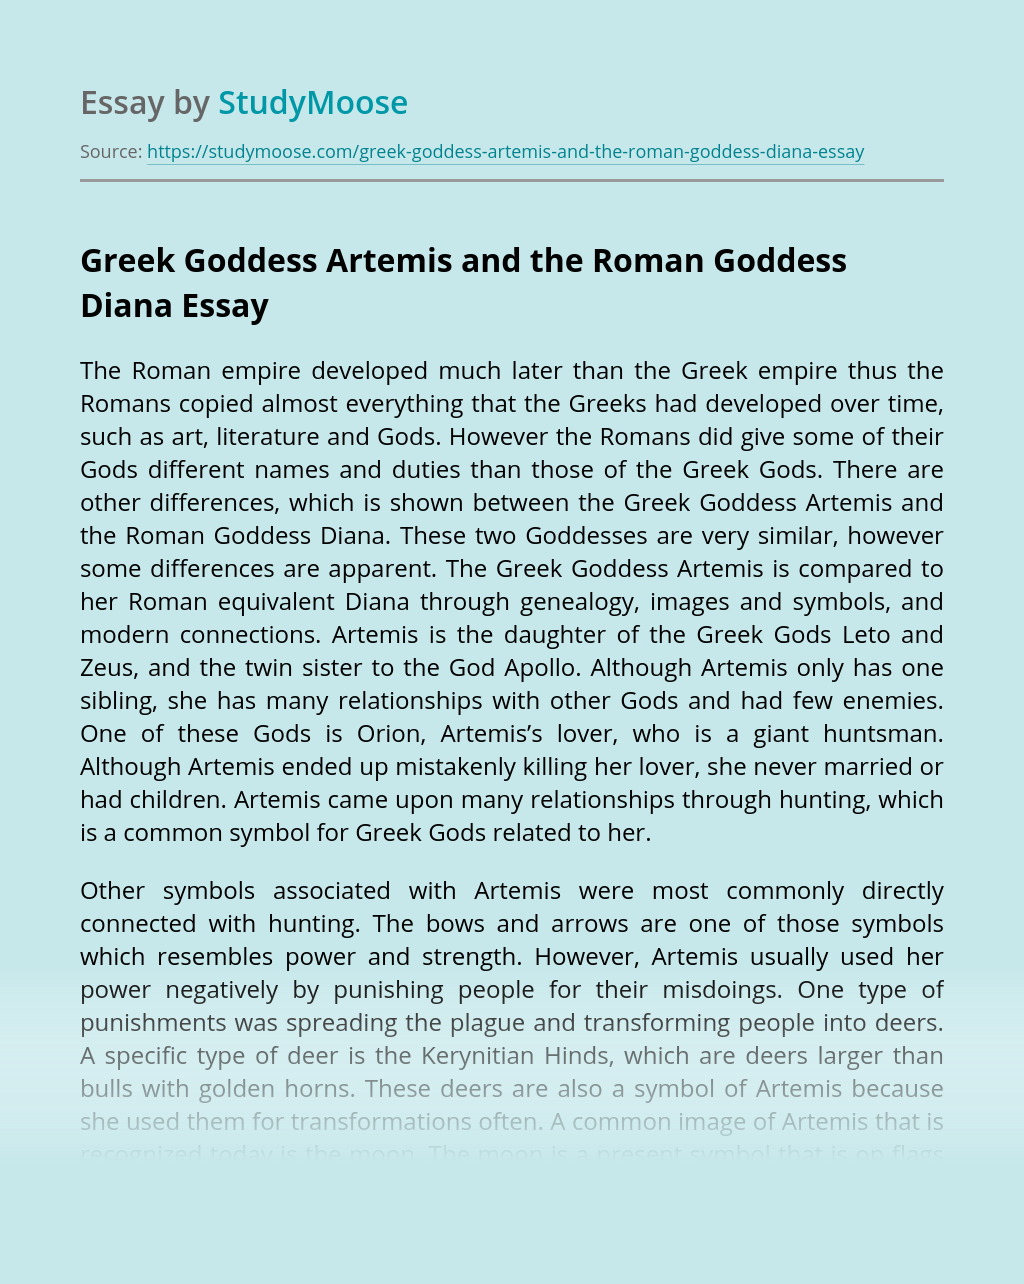 Greek Goddess Artemis and the Roman Goddess Diana